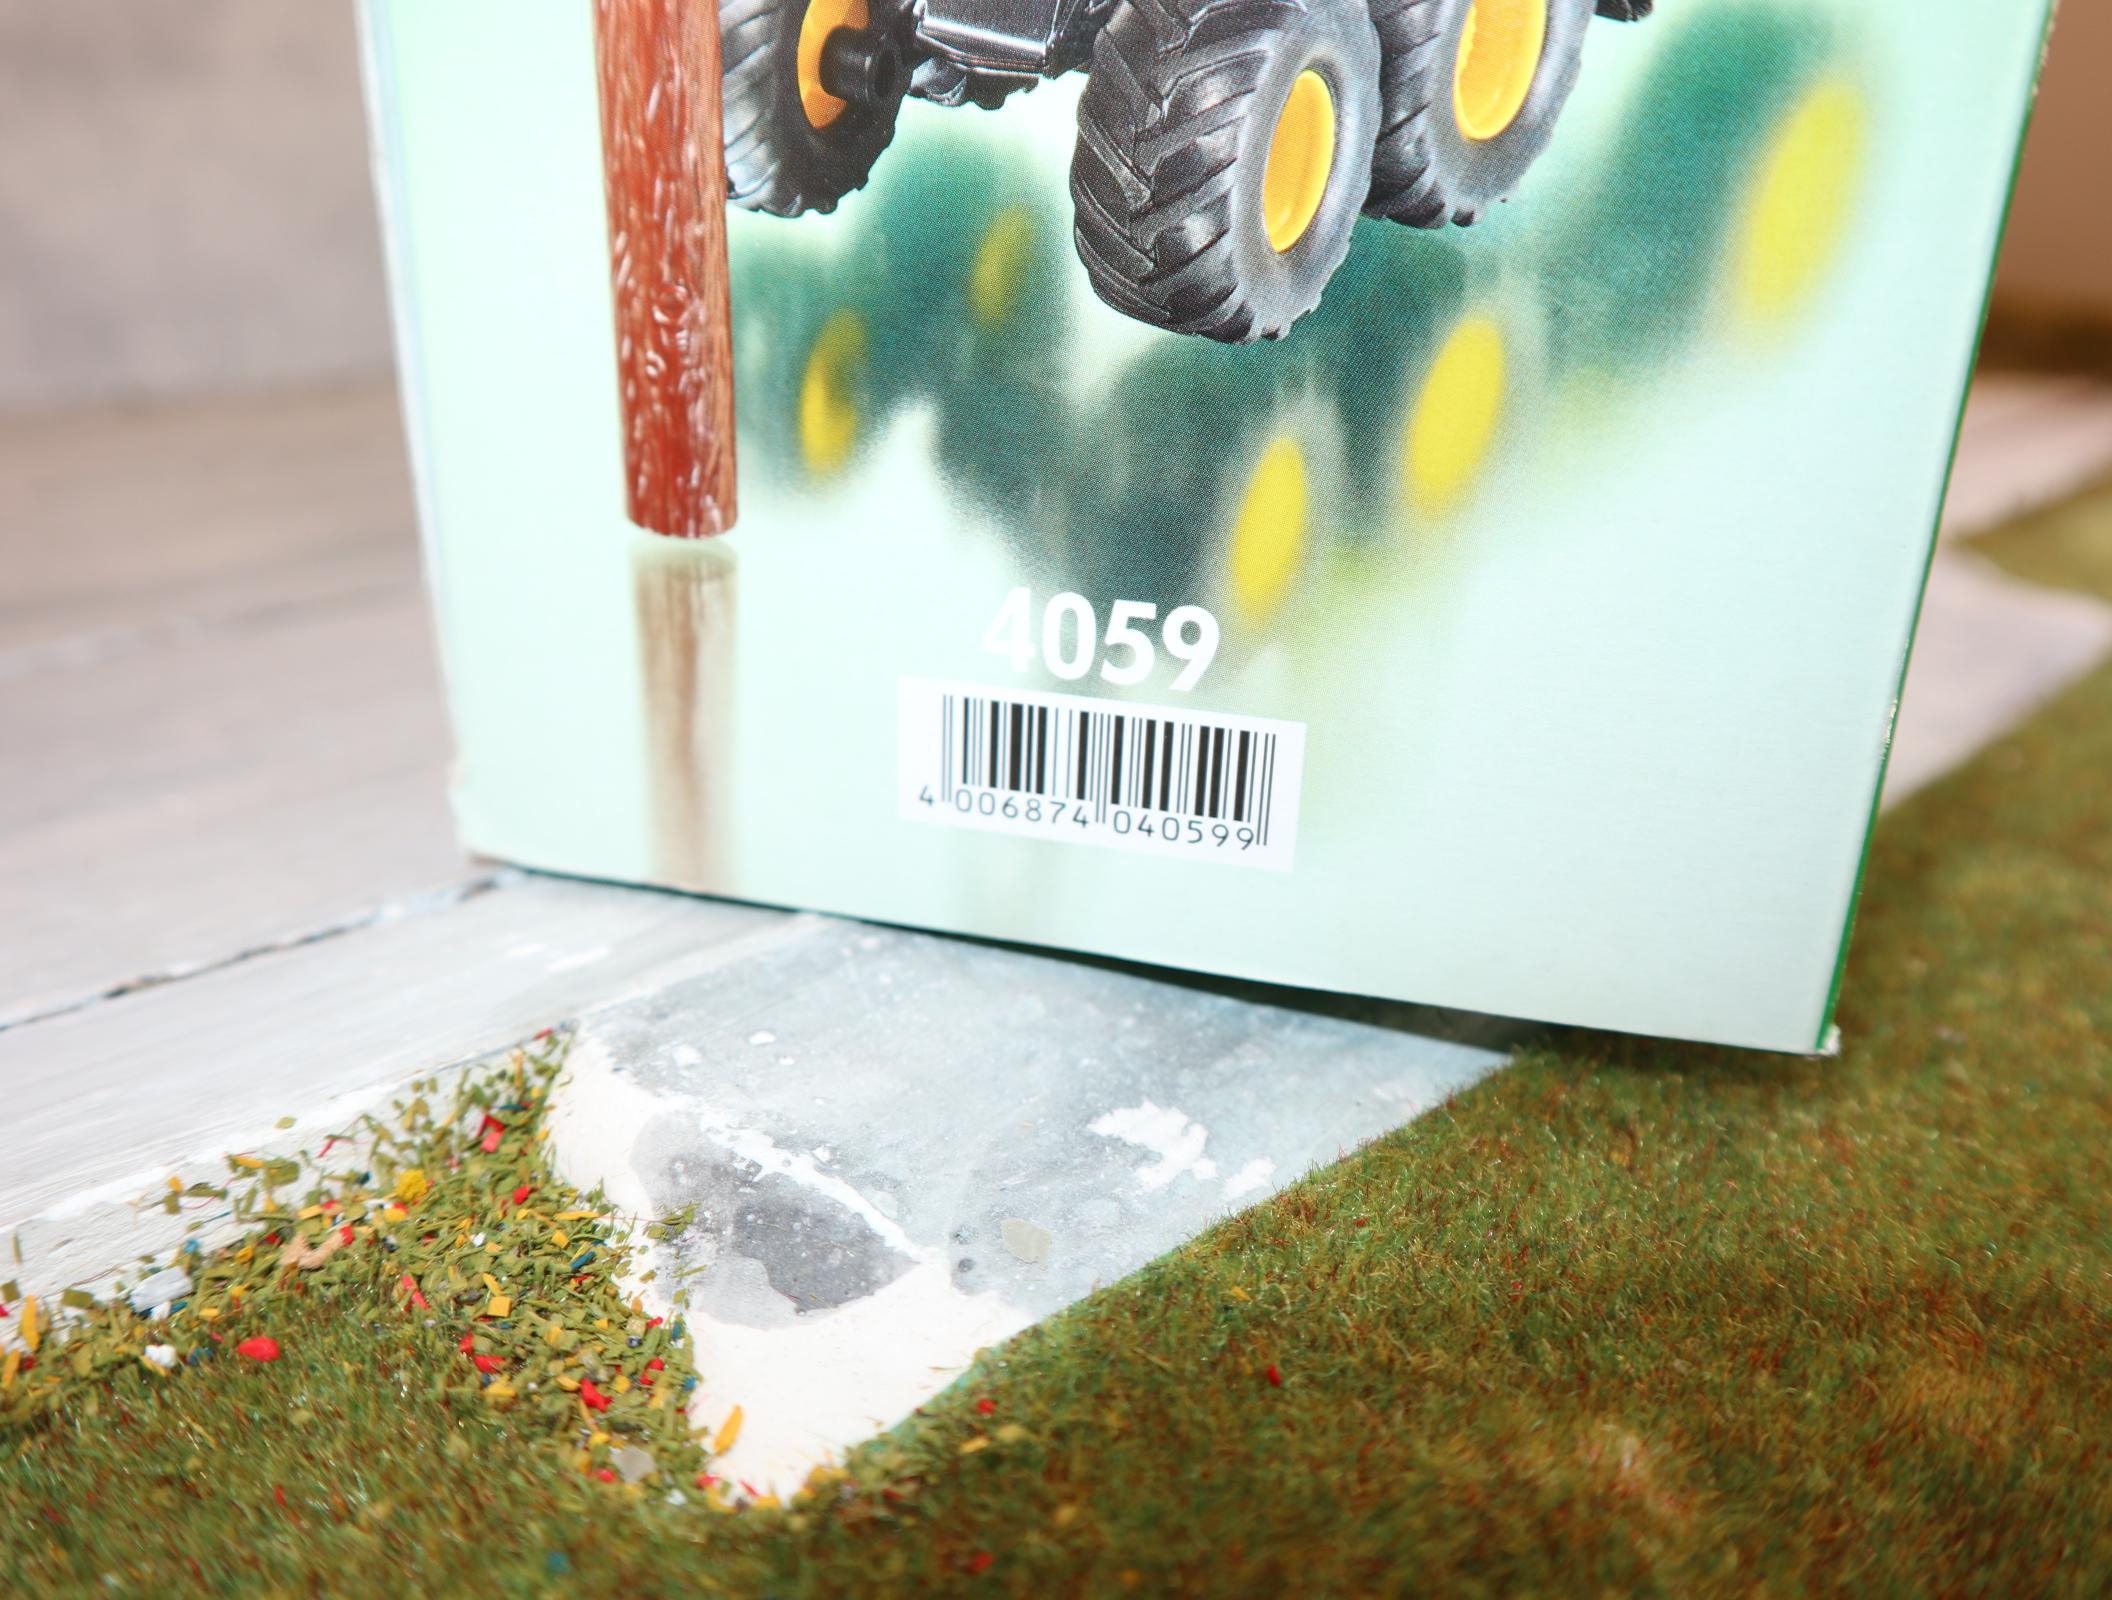 Siku 4059 1:32 John Deere Harvester